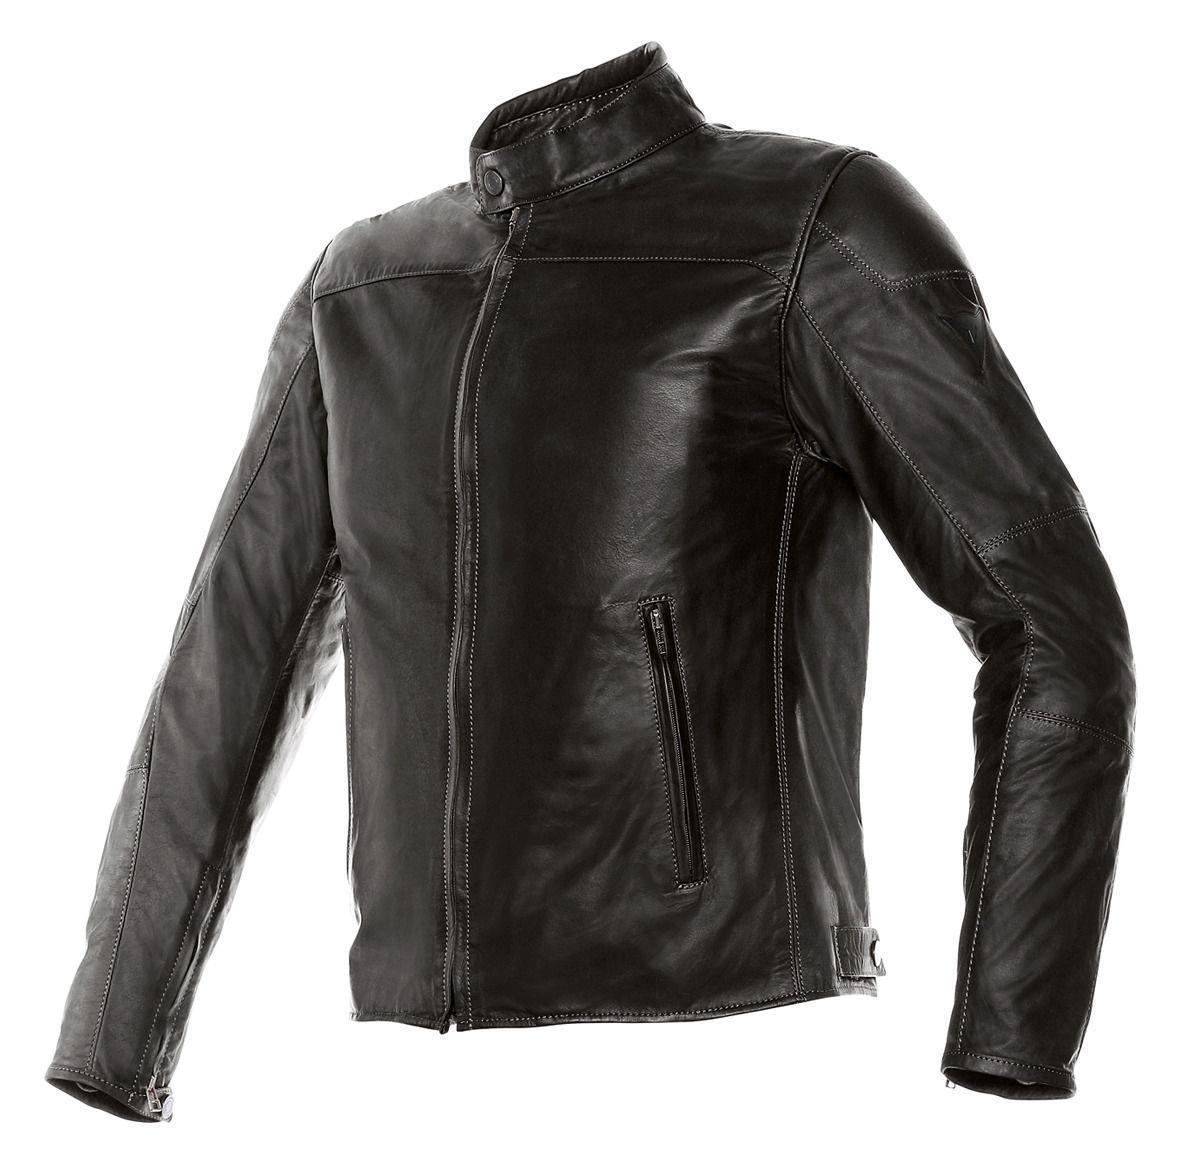 Leather jacket sale - Leather Jacket Sale 34